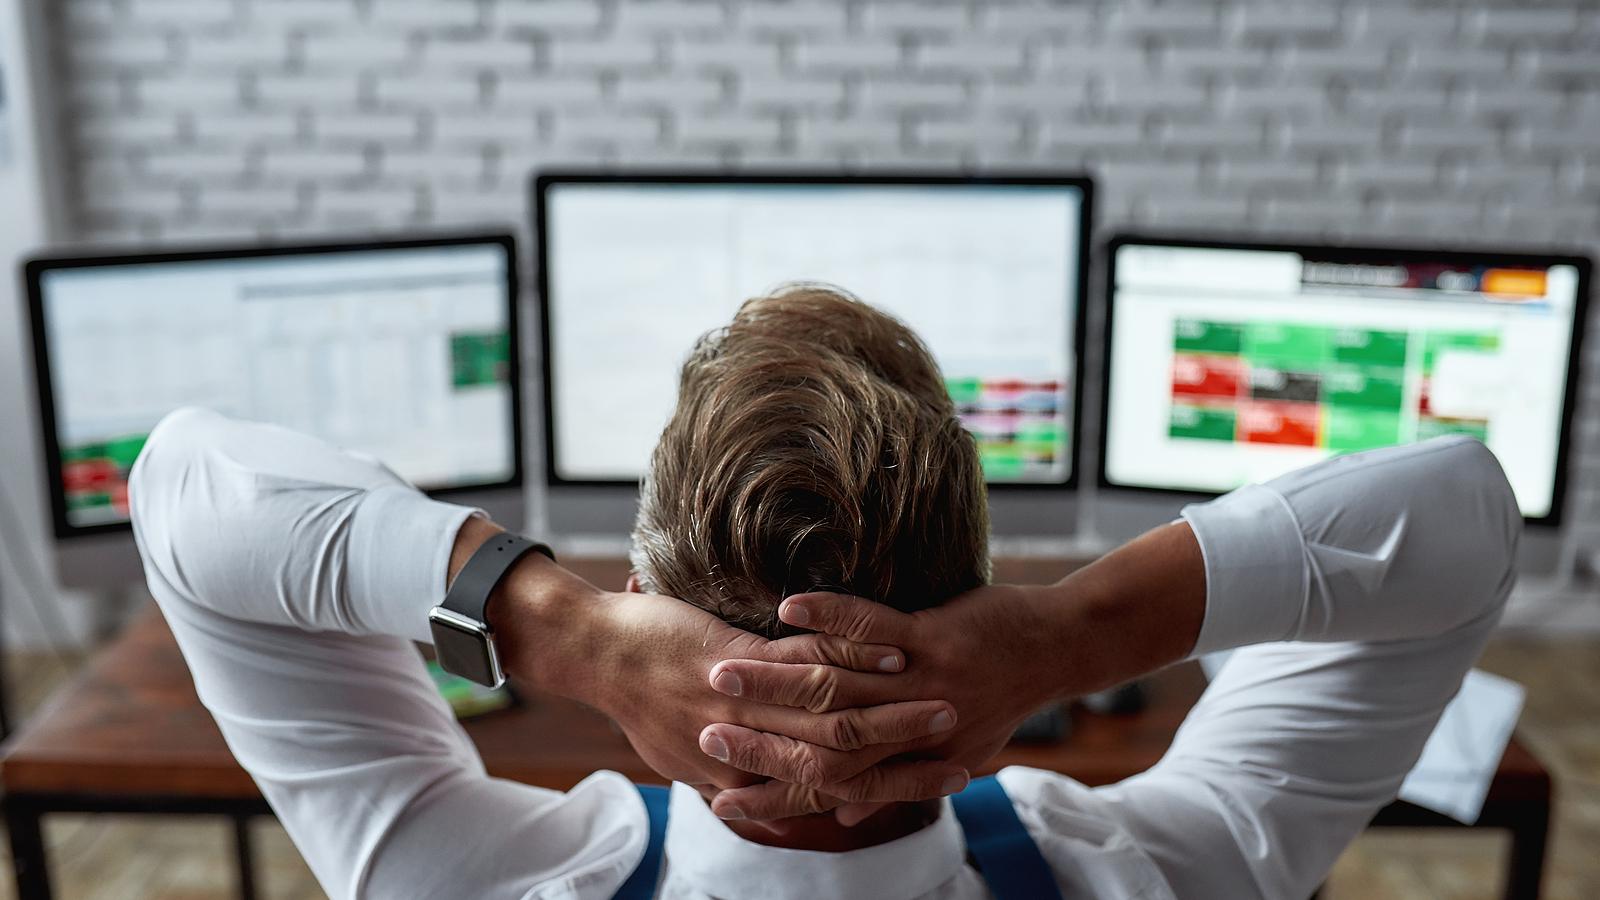 5 Best Stock Trading Apps for Beginners